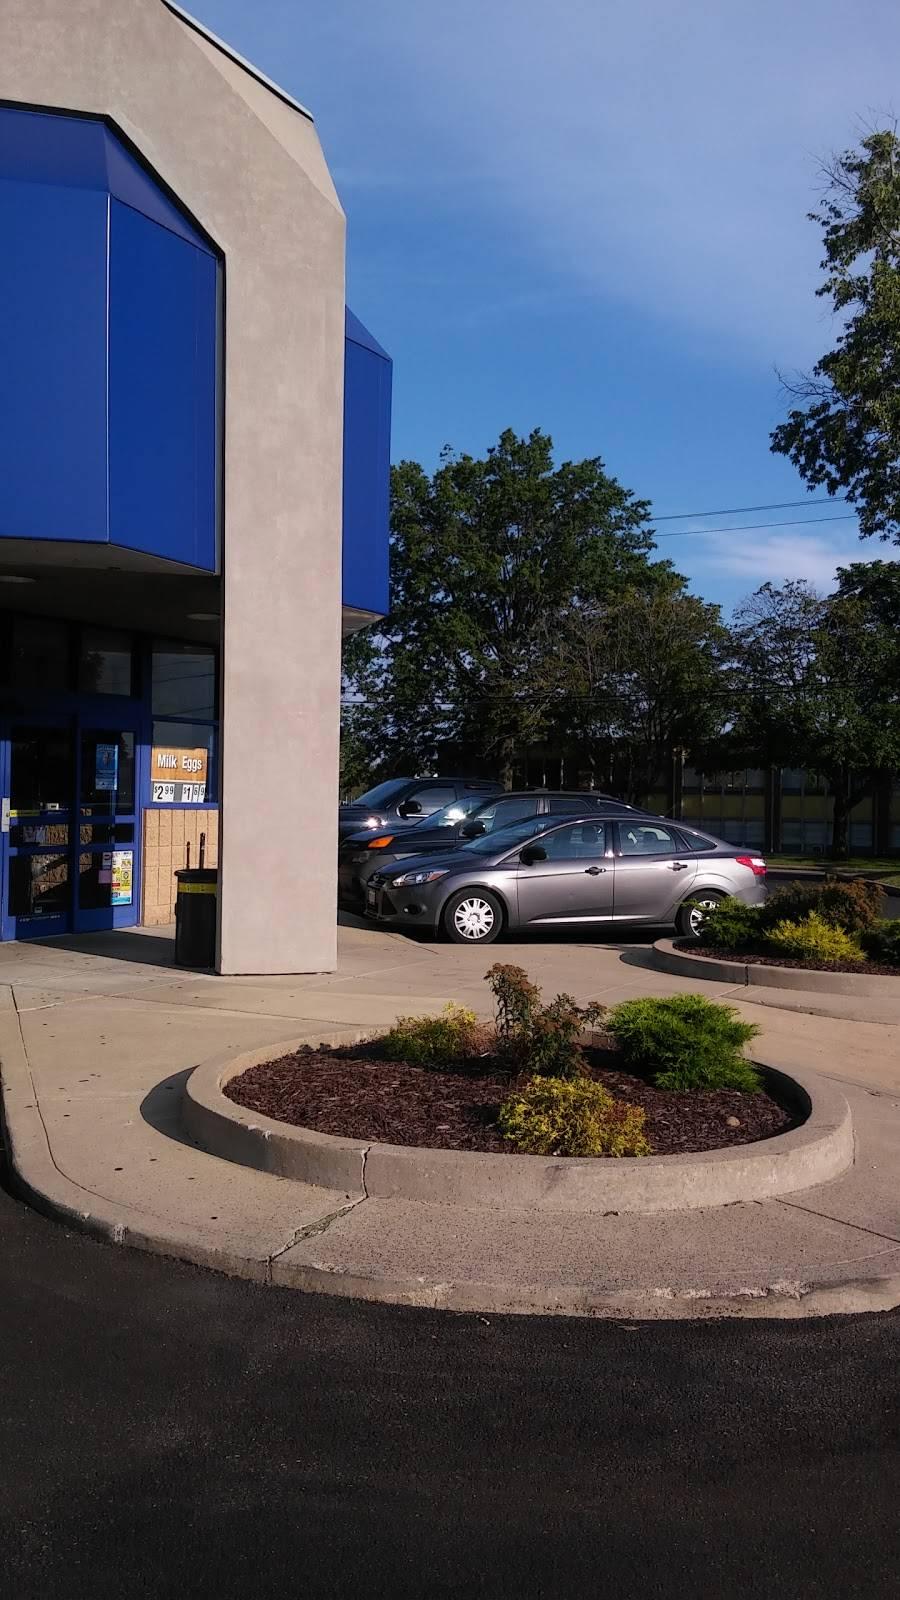 Rite Aid Pharmacy - pharmacy  | Photo 6 of 7 | Address: 30500 Lakeshore Blvd, Willowick, OH 44095, USA | Phone: (440) 943-2127